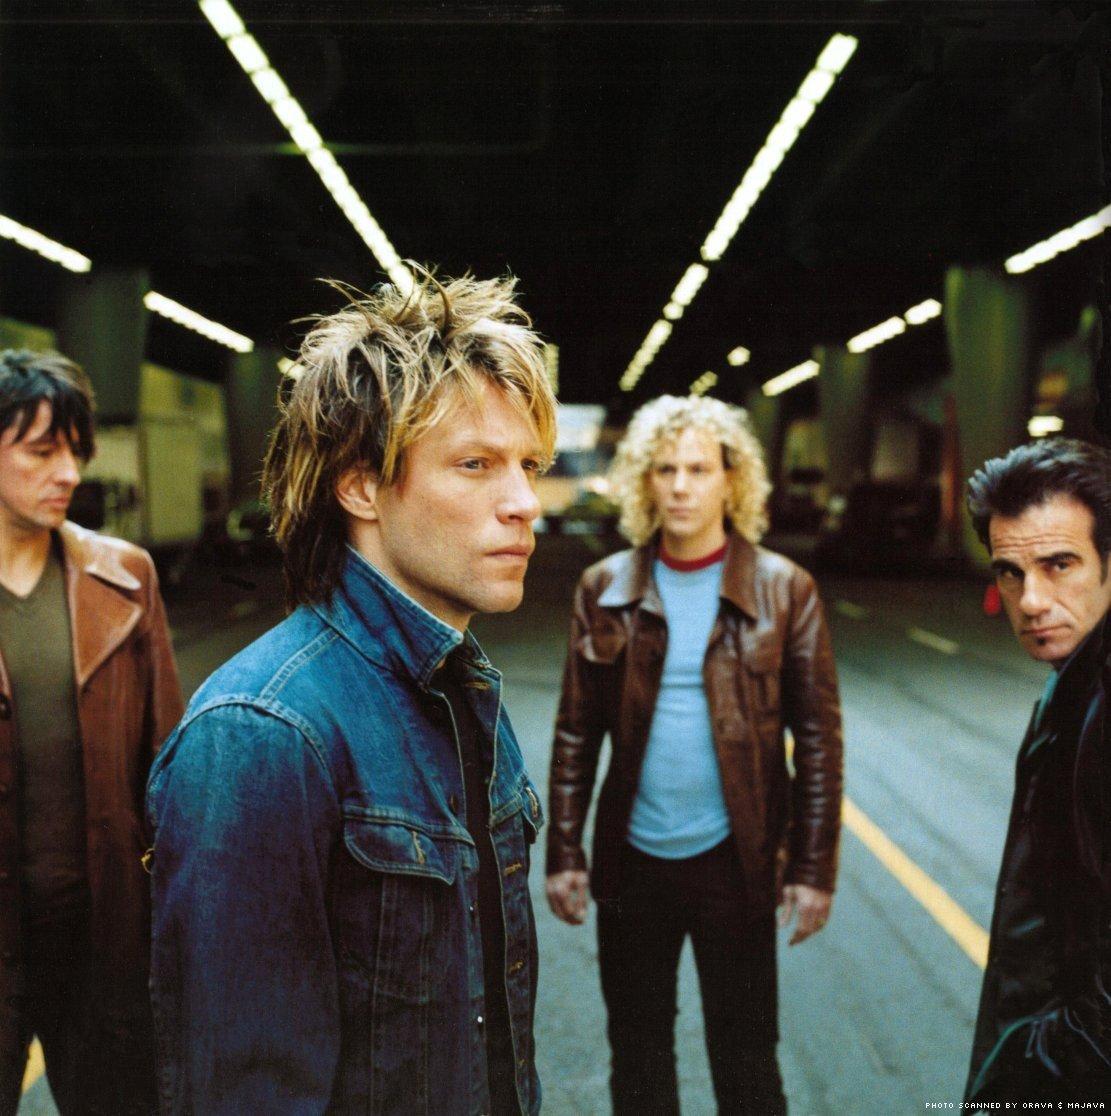 Bon Jovi Scars On This Guitar Song Lyrics: Bon Jovi Song Lyrics